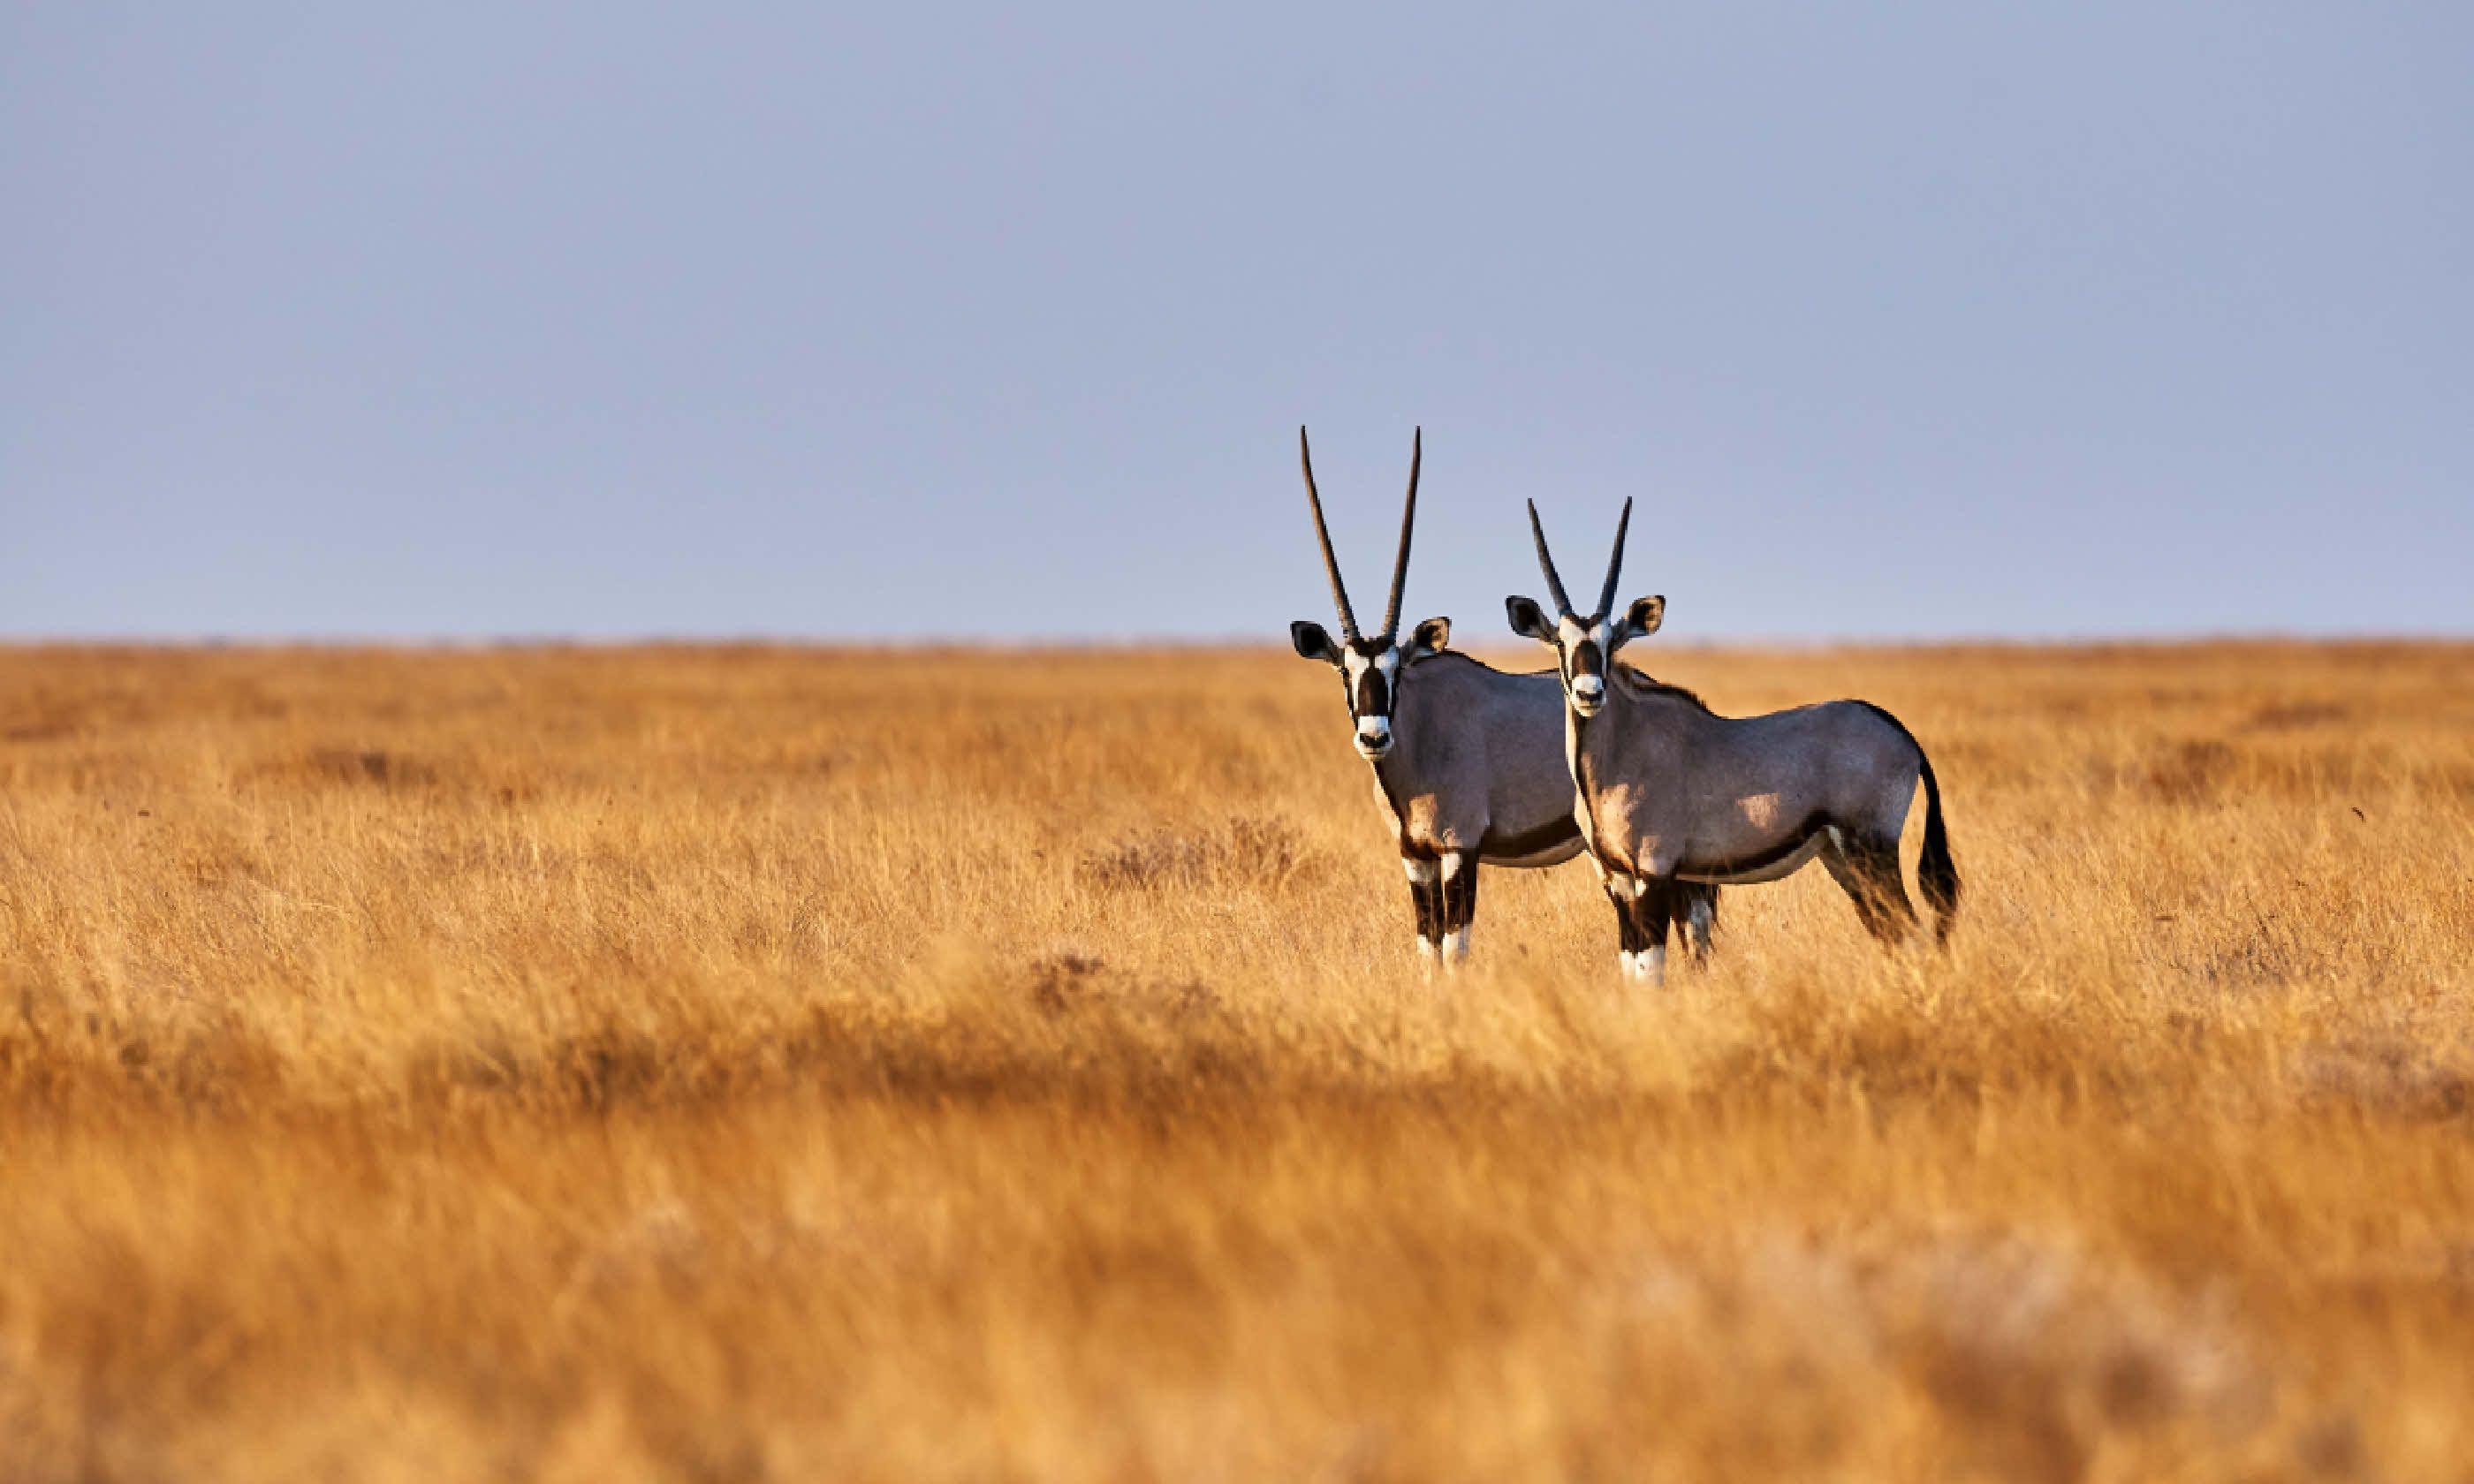 Oryx, Namibia (Shutterstock)